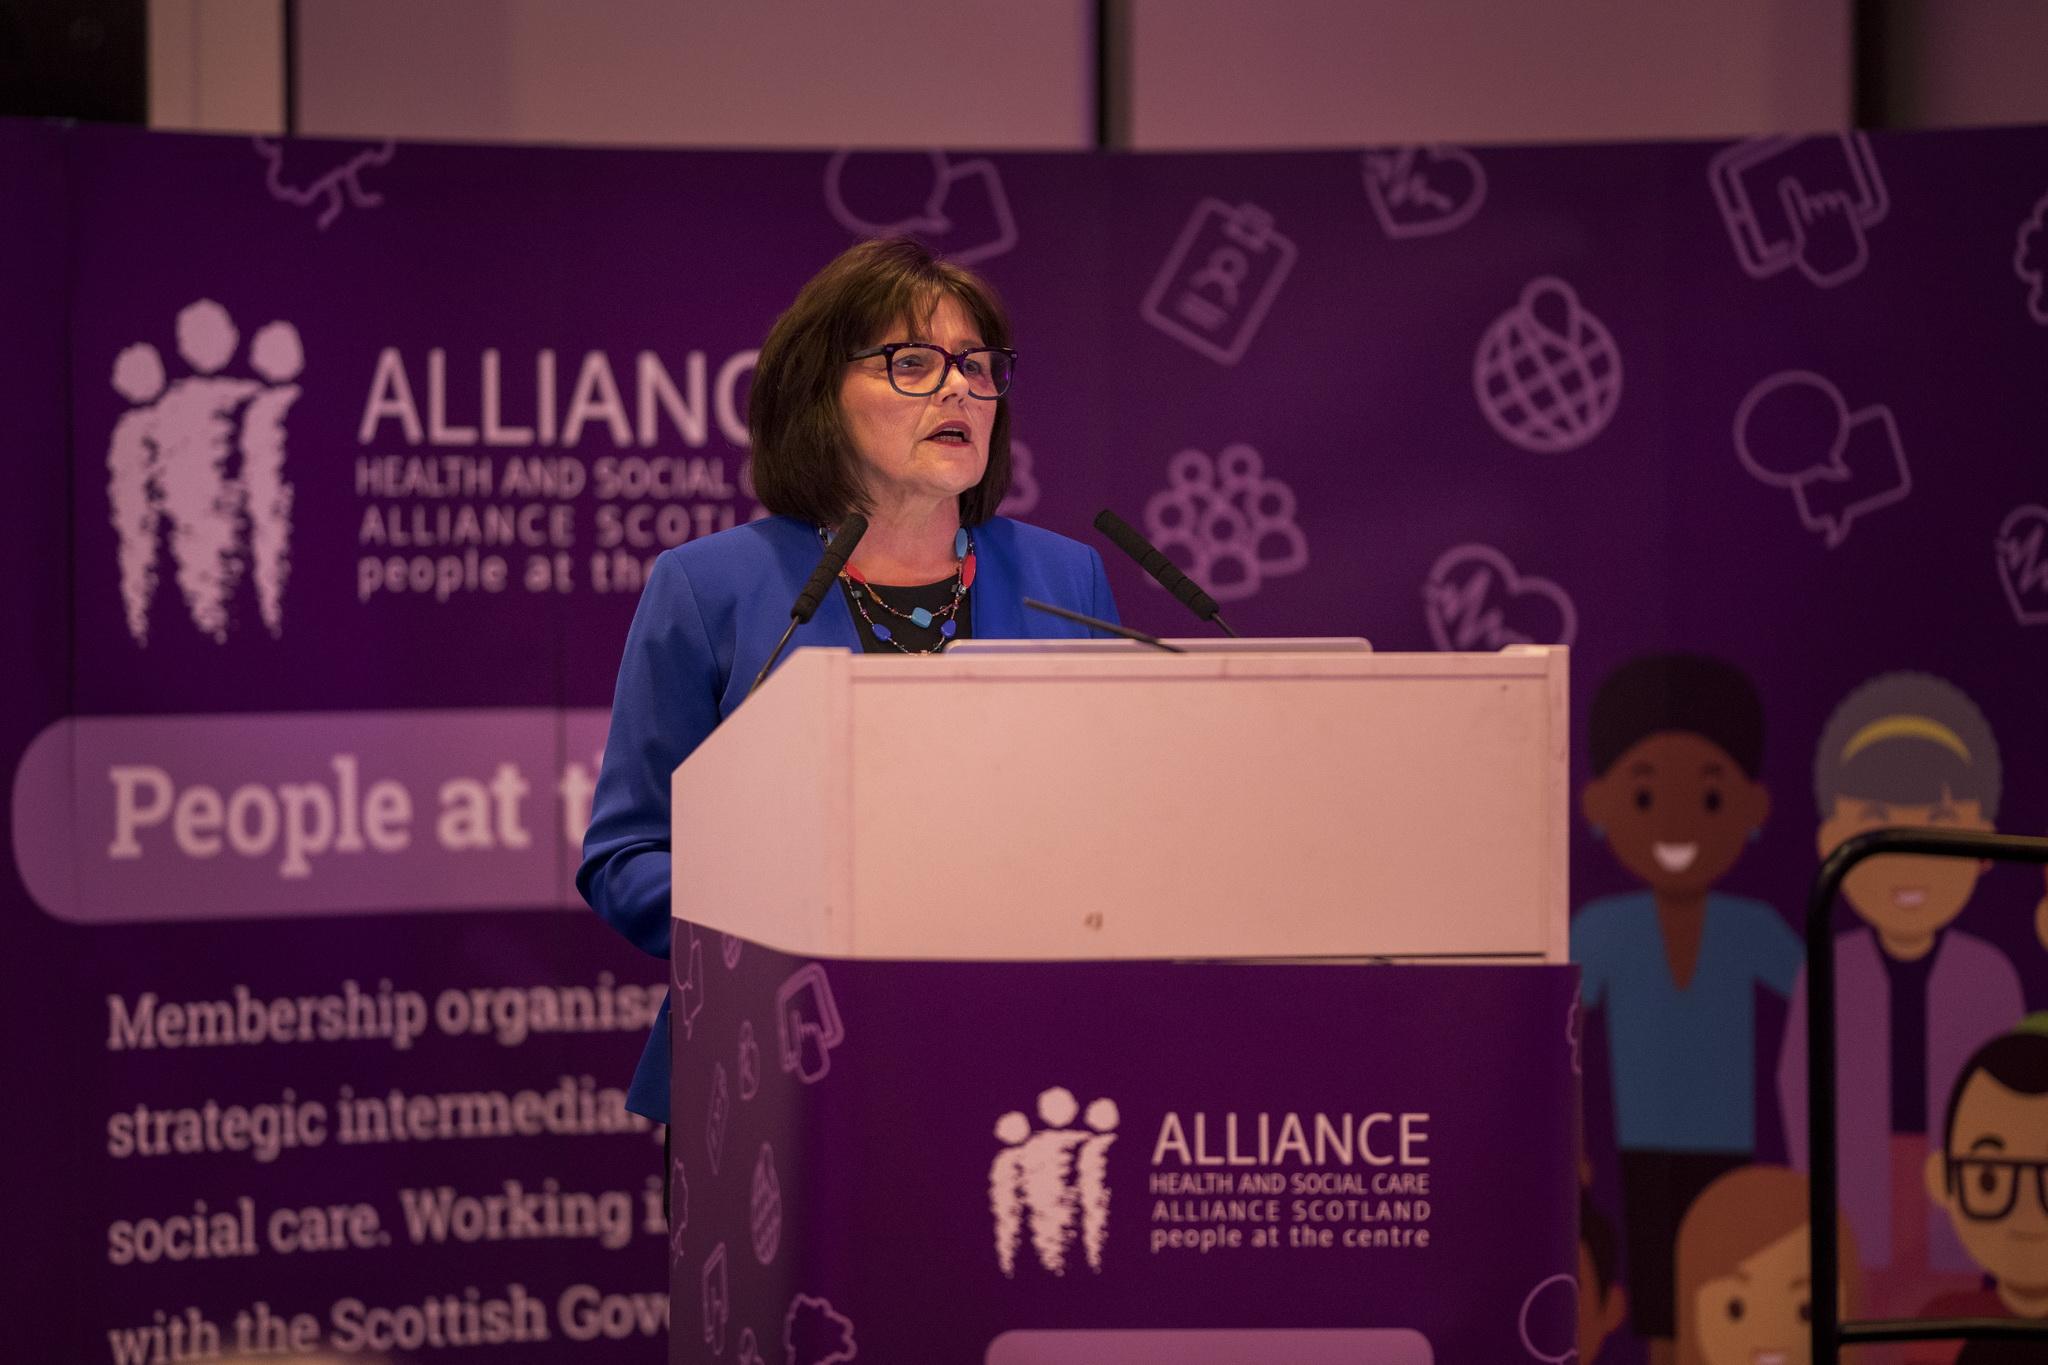 Photo of Cabinet Secretary Jeane Freeman standing on stage